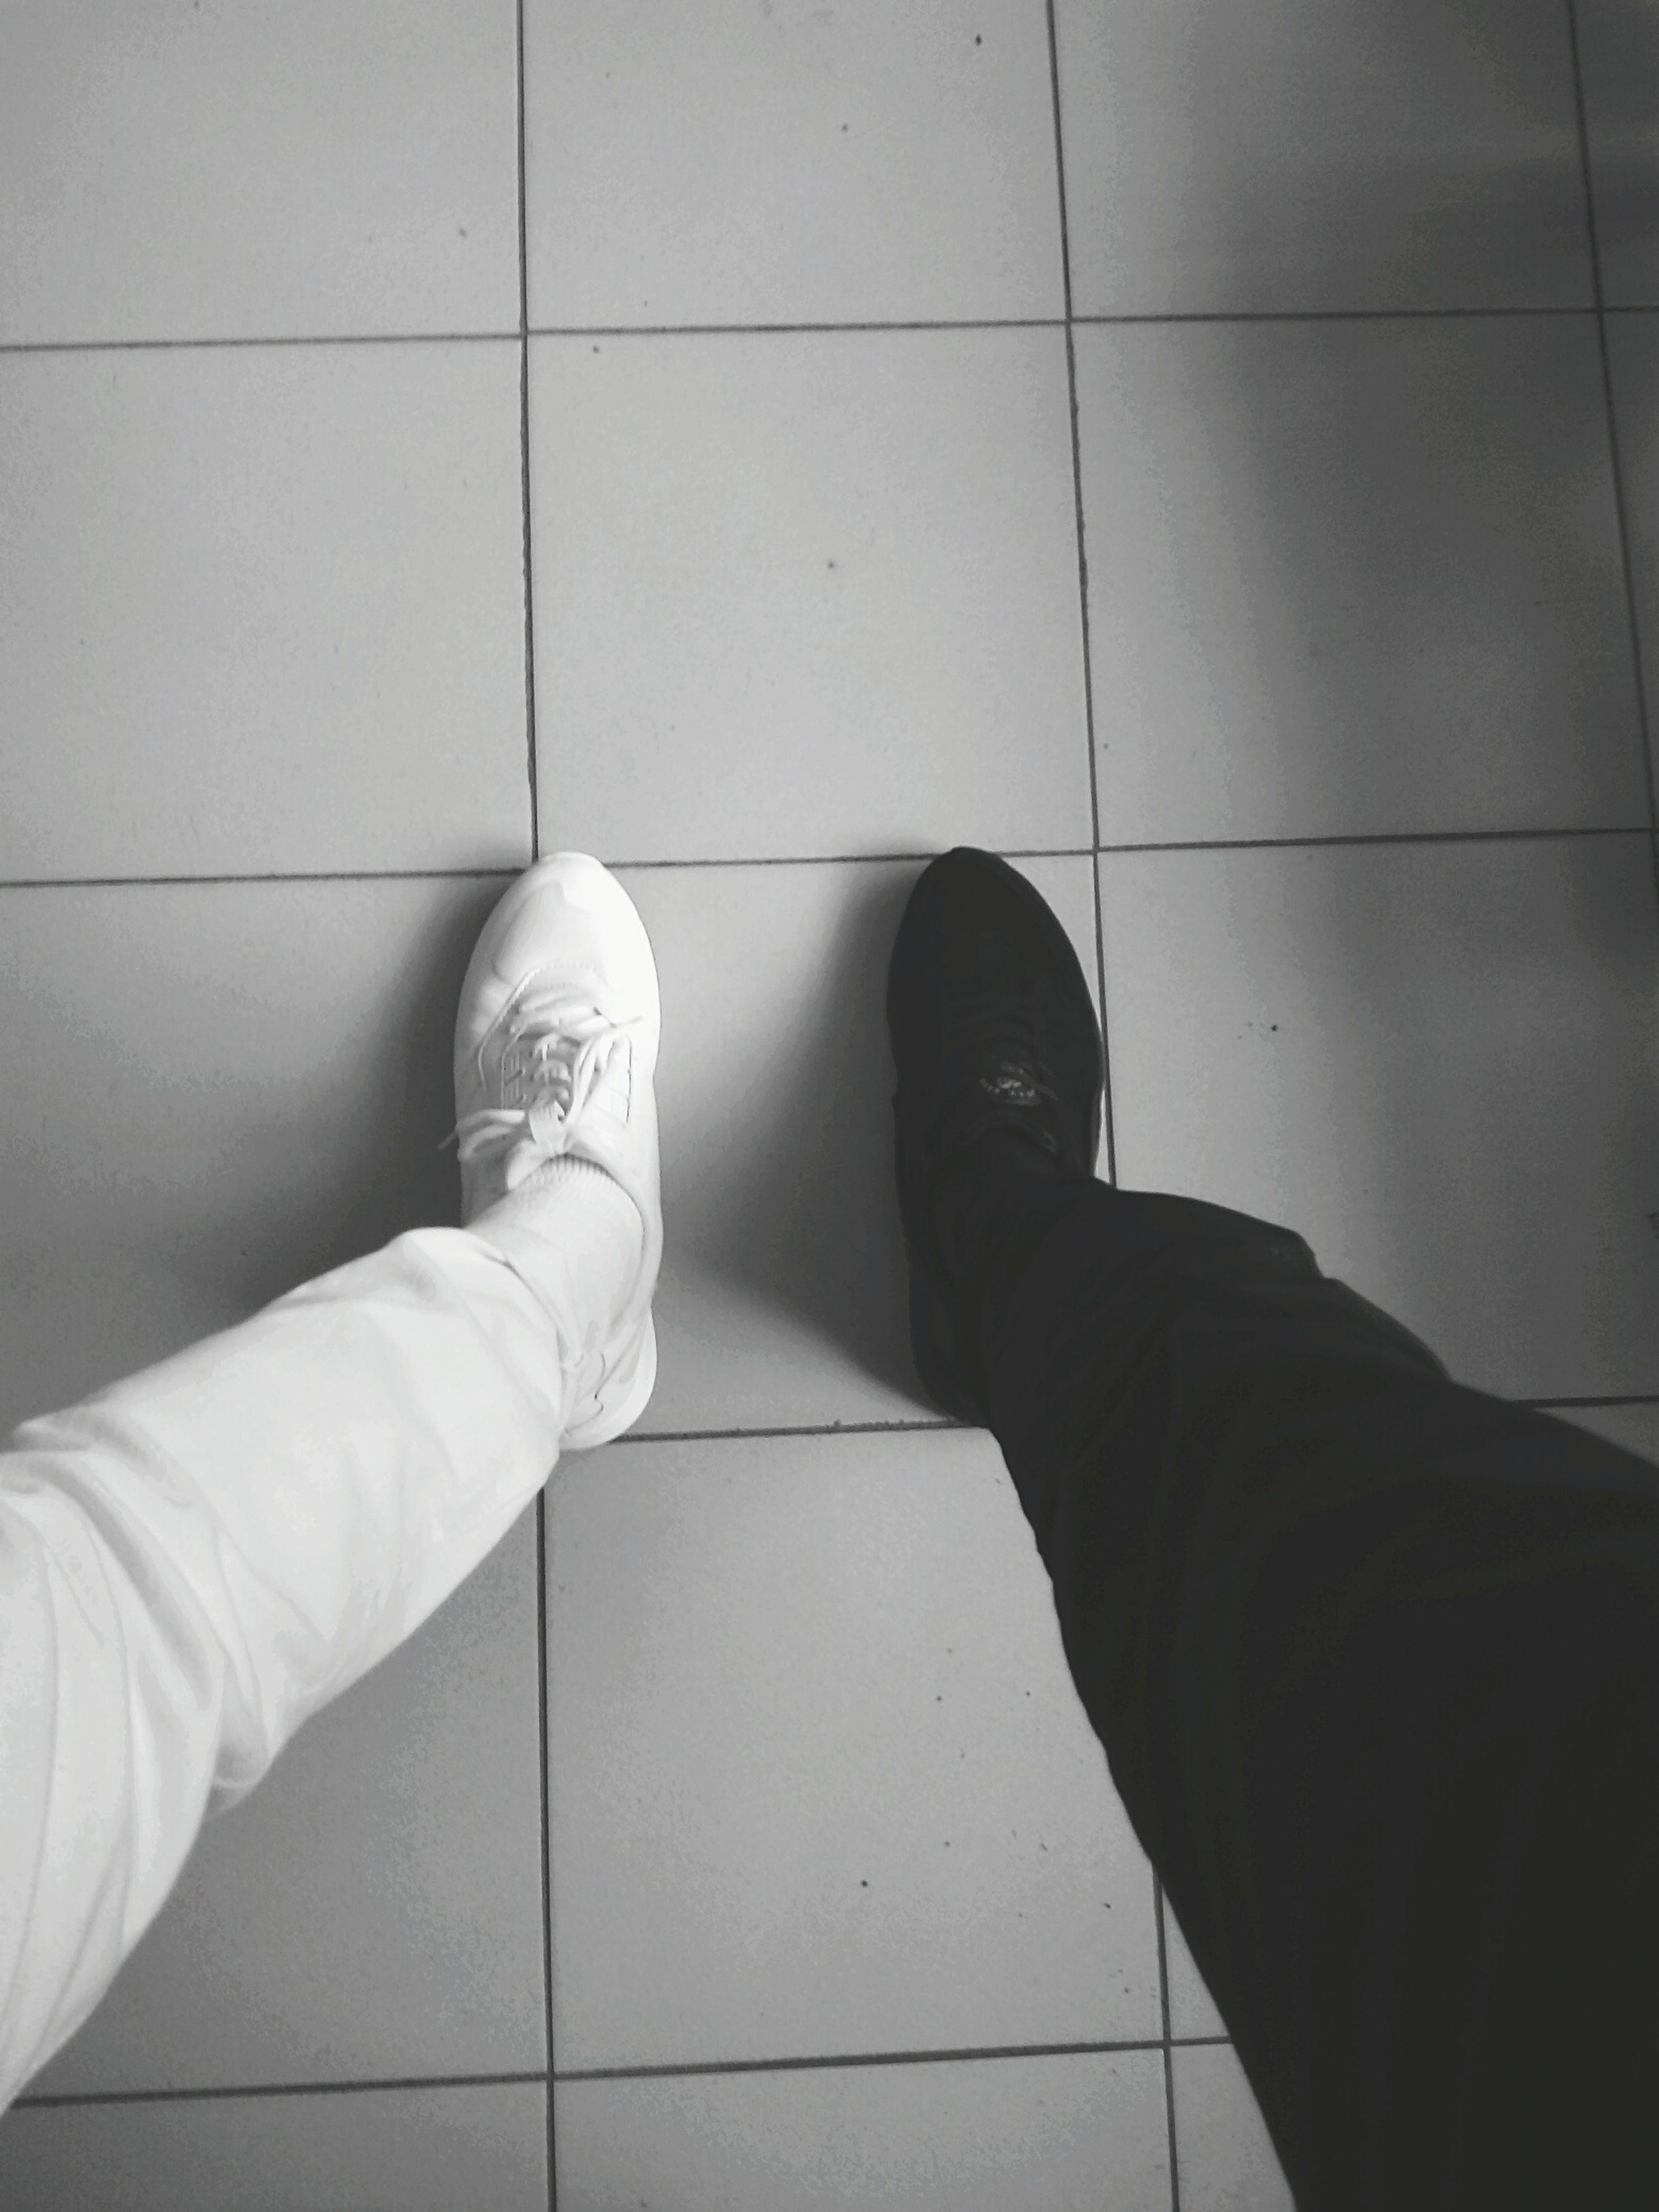 low section, person, standing, personal perspective, indoors, shoe, tiled floor, footwear, men, human foot, tile